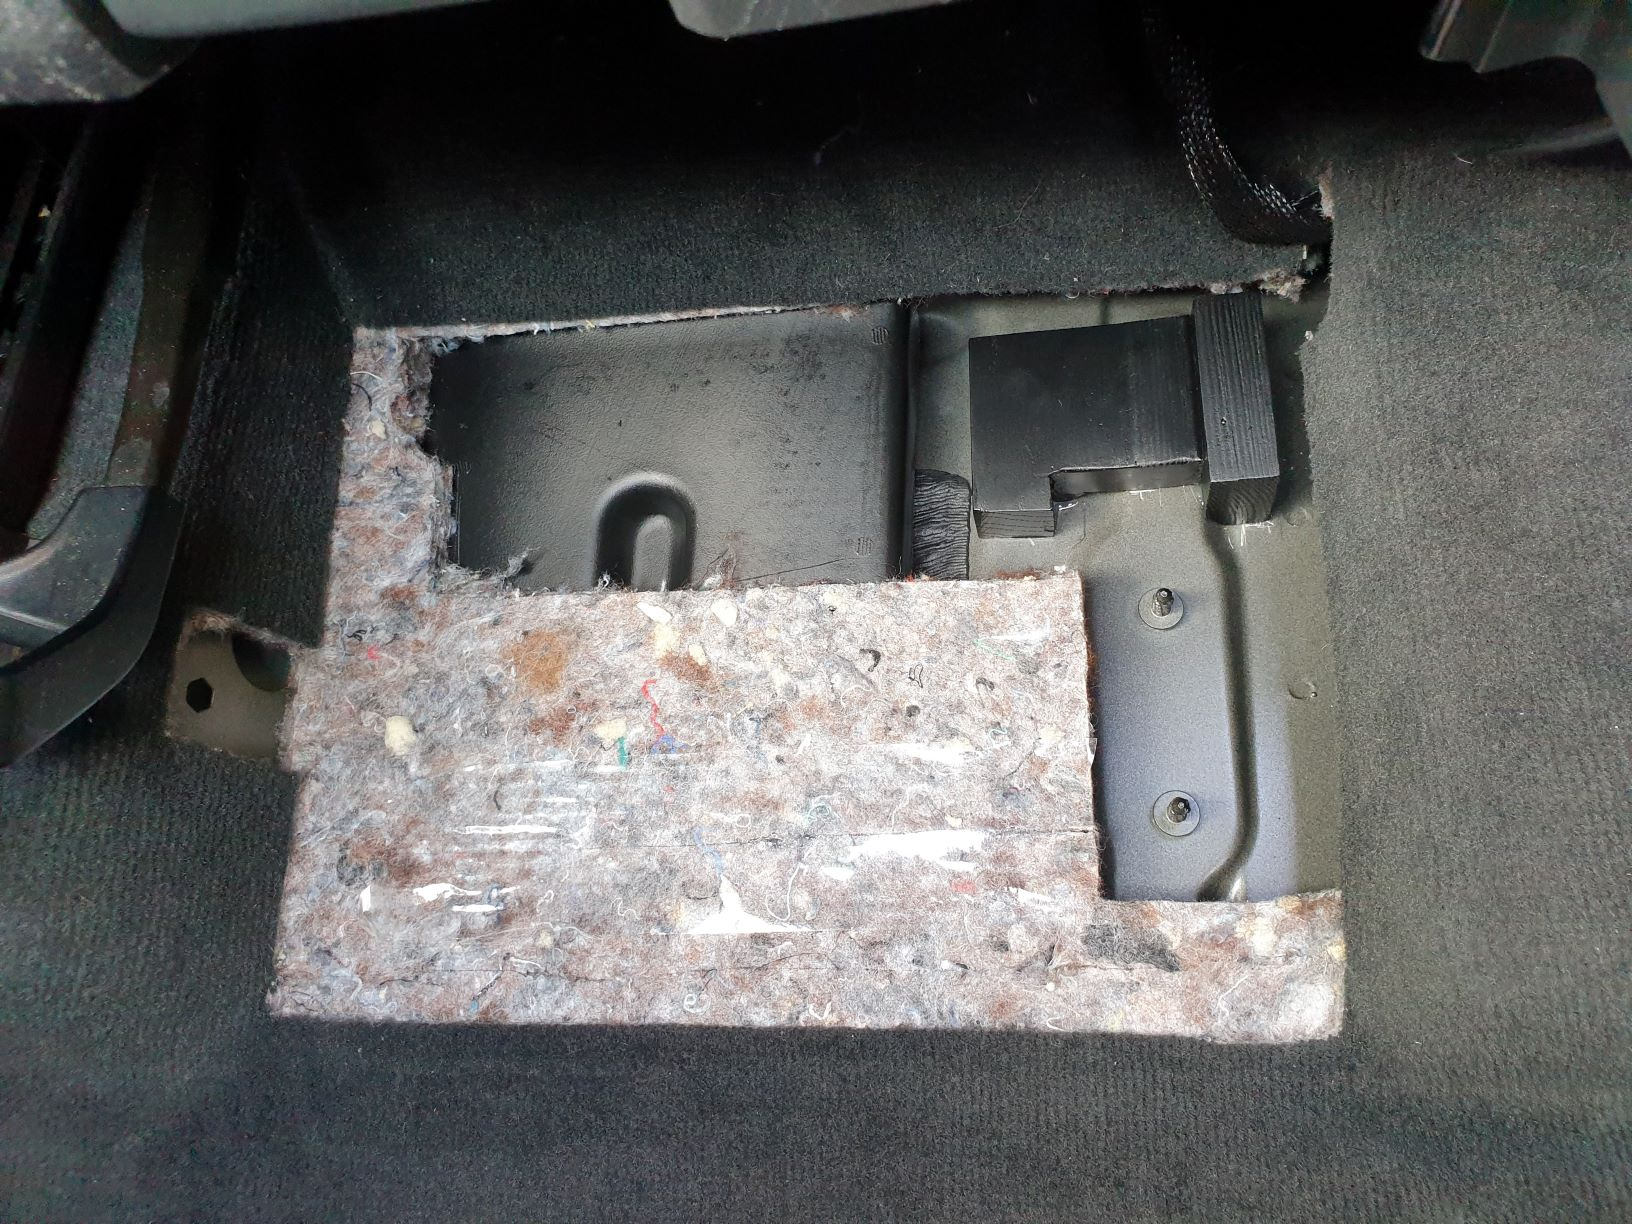 carpet removal under passenger seat.jpg